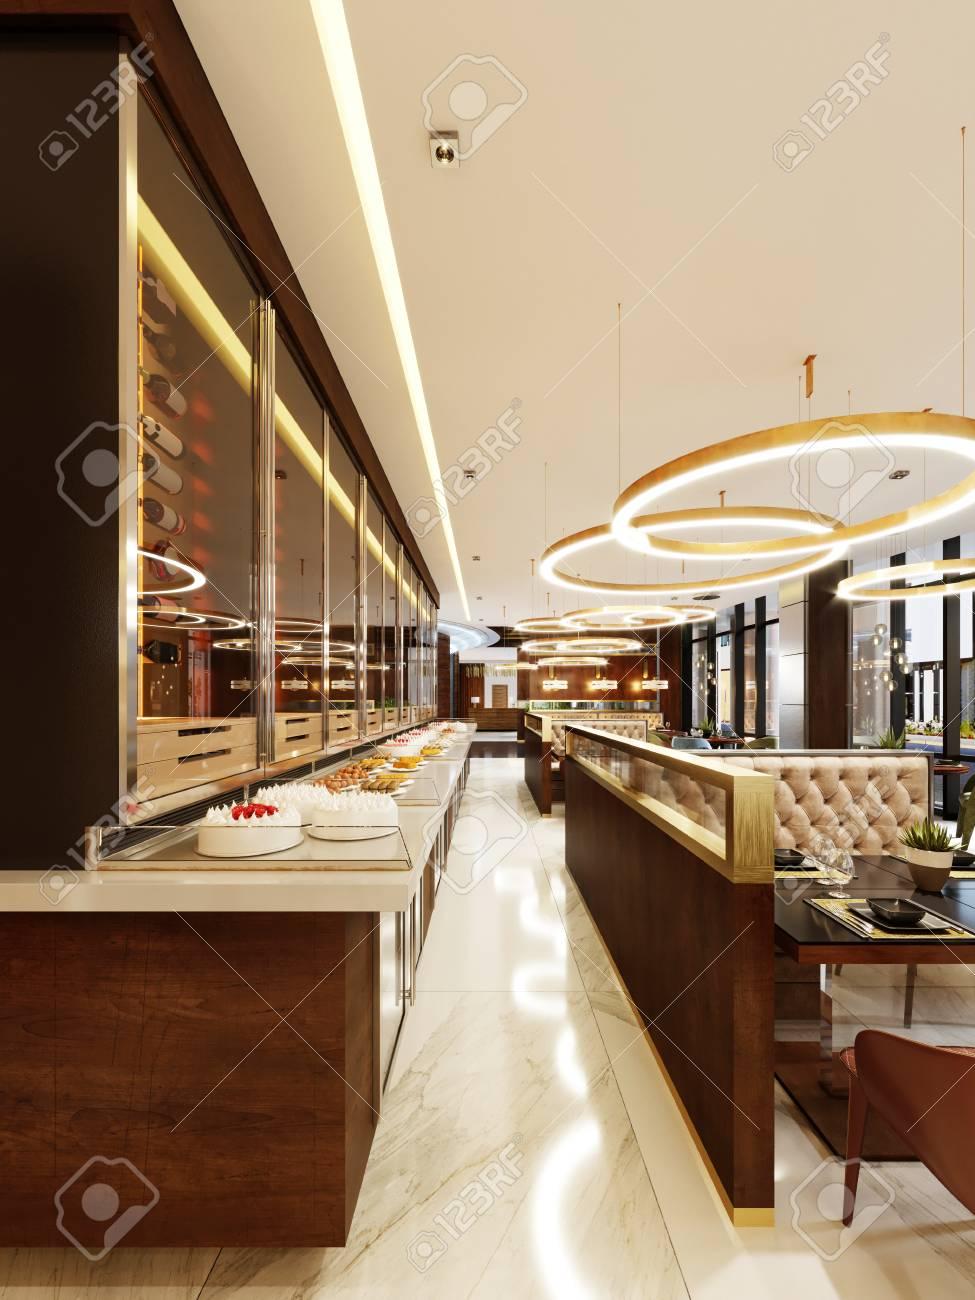 Decorative Wall In Modern Restaurant With Bottles Under Glass ...